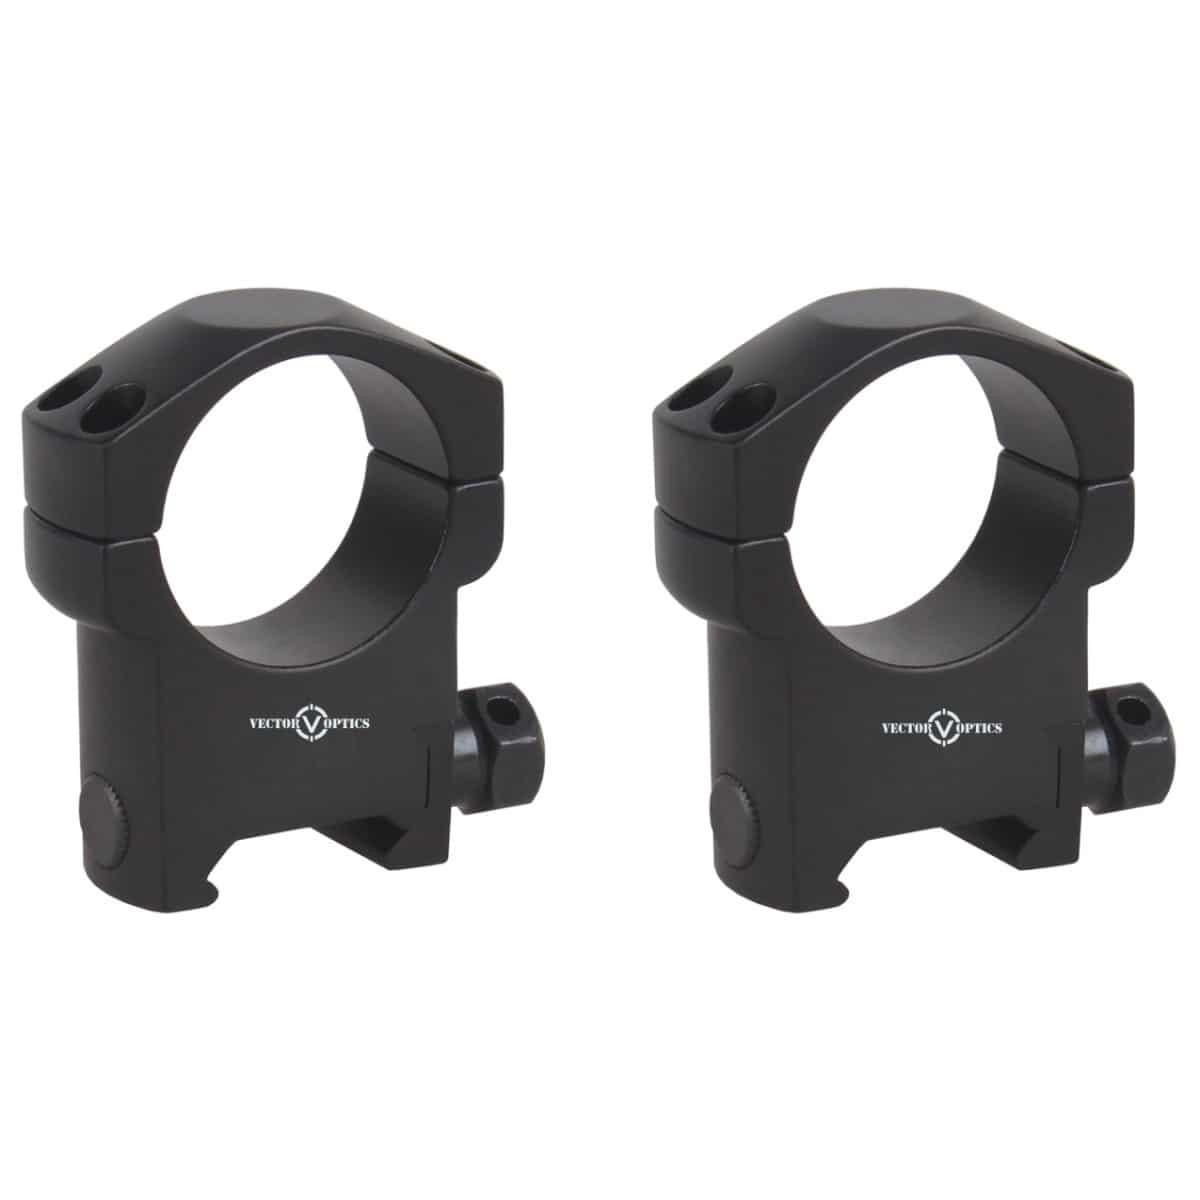 Tactical 30mm High Mark Weaver Mount Ring